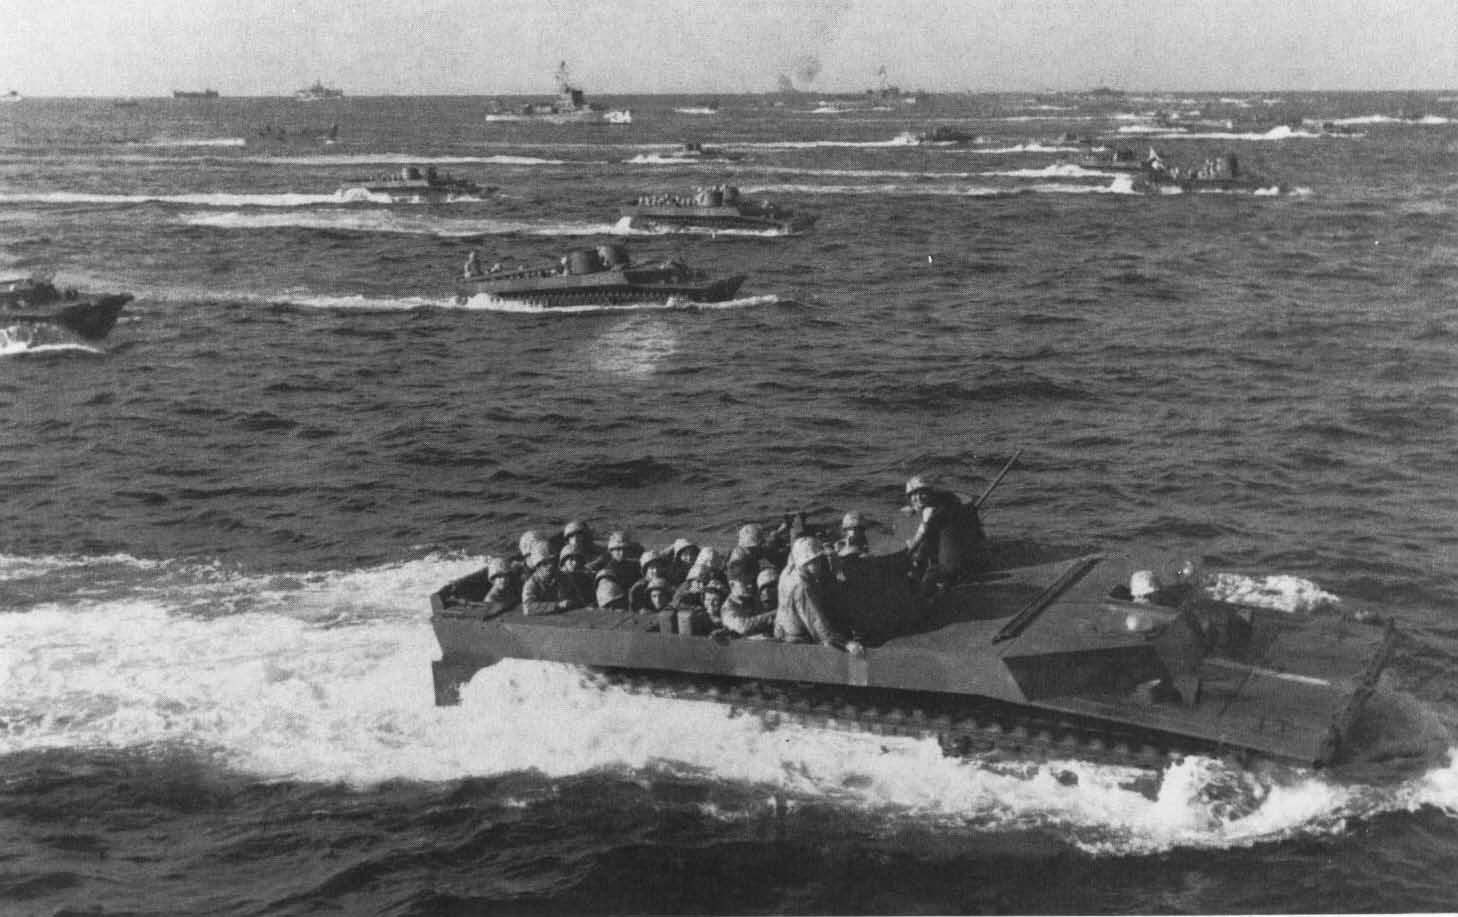 File:Tracked landing vehicles (LVTs) approach Iwo Jima;fig14.jpg